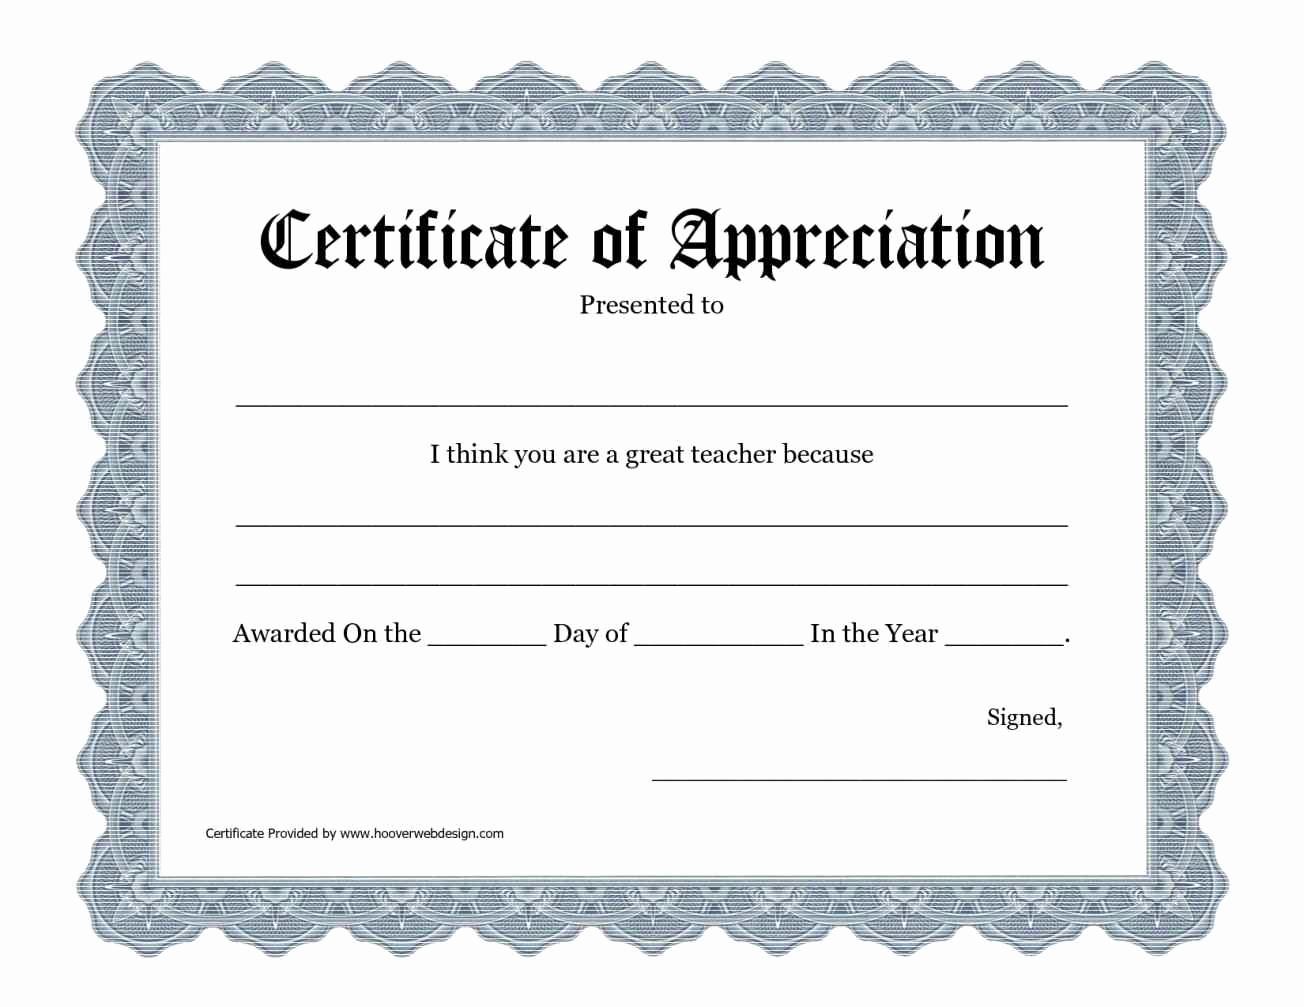 Certificate Of Appreciation Template Free Fresh Free Printable Certificate Appreciation Templates